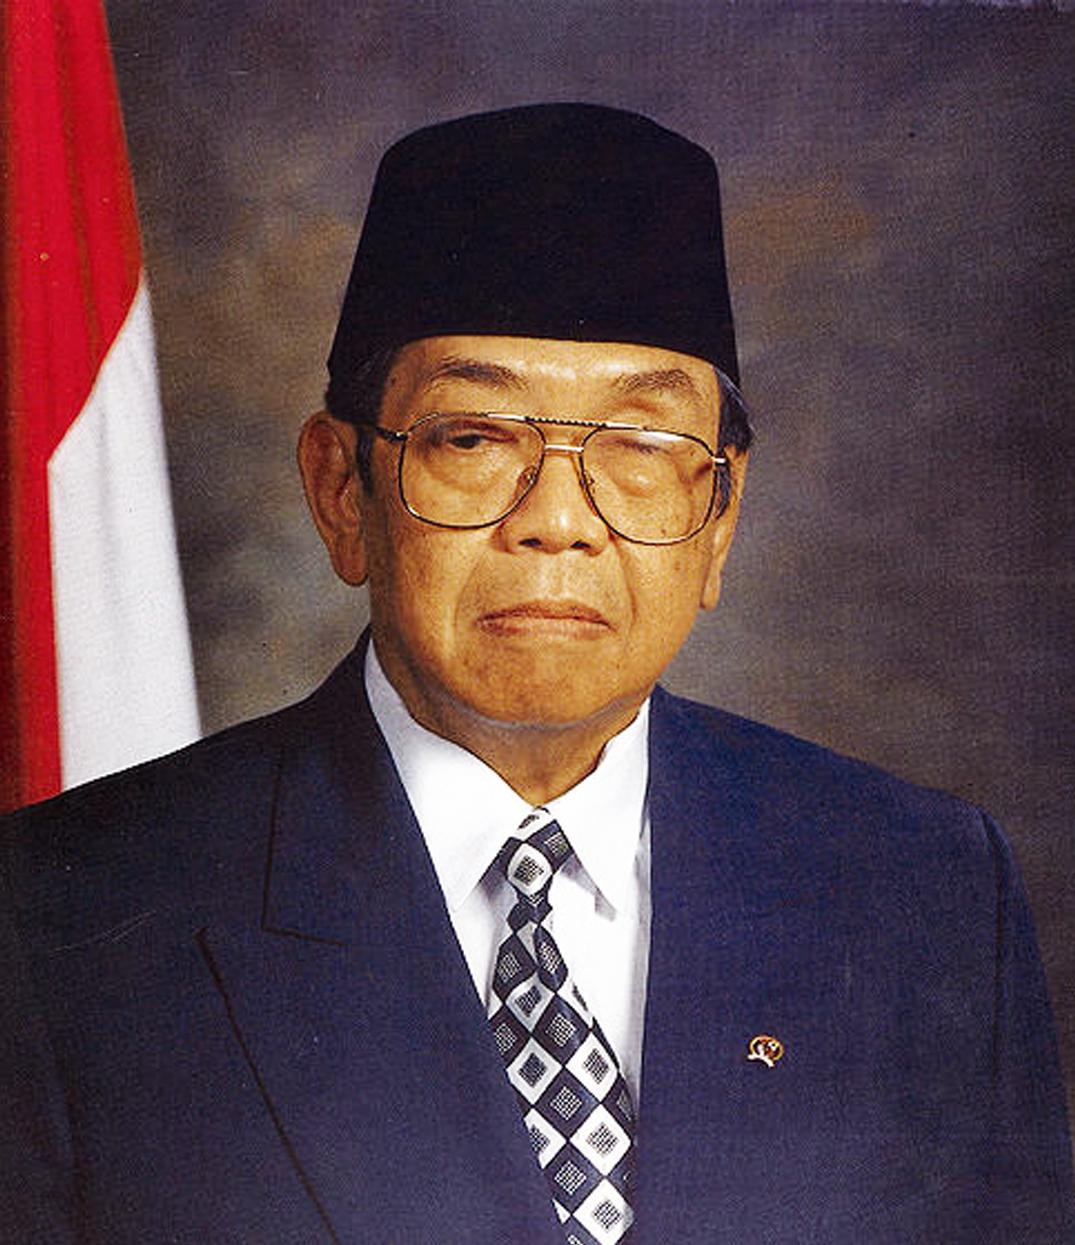 Presiden Abdurrahman Wahid (Gusdur) berwarna